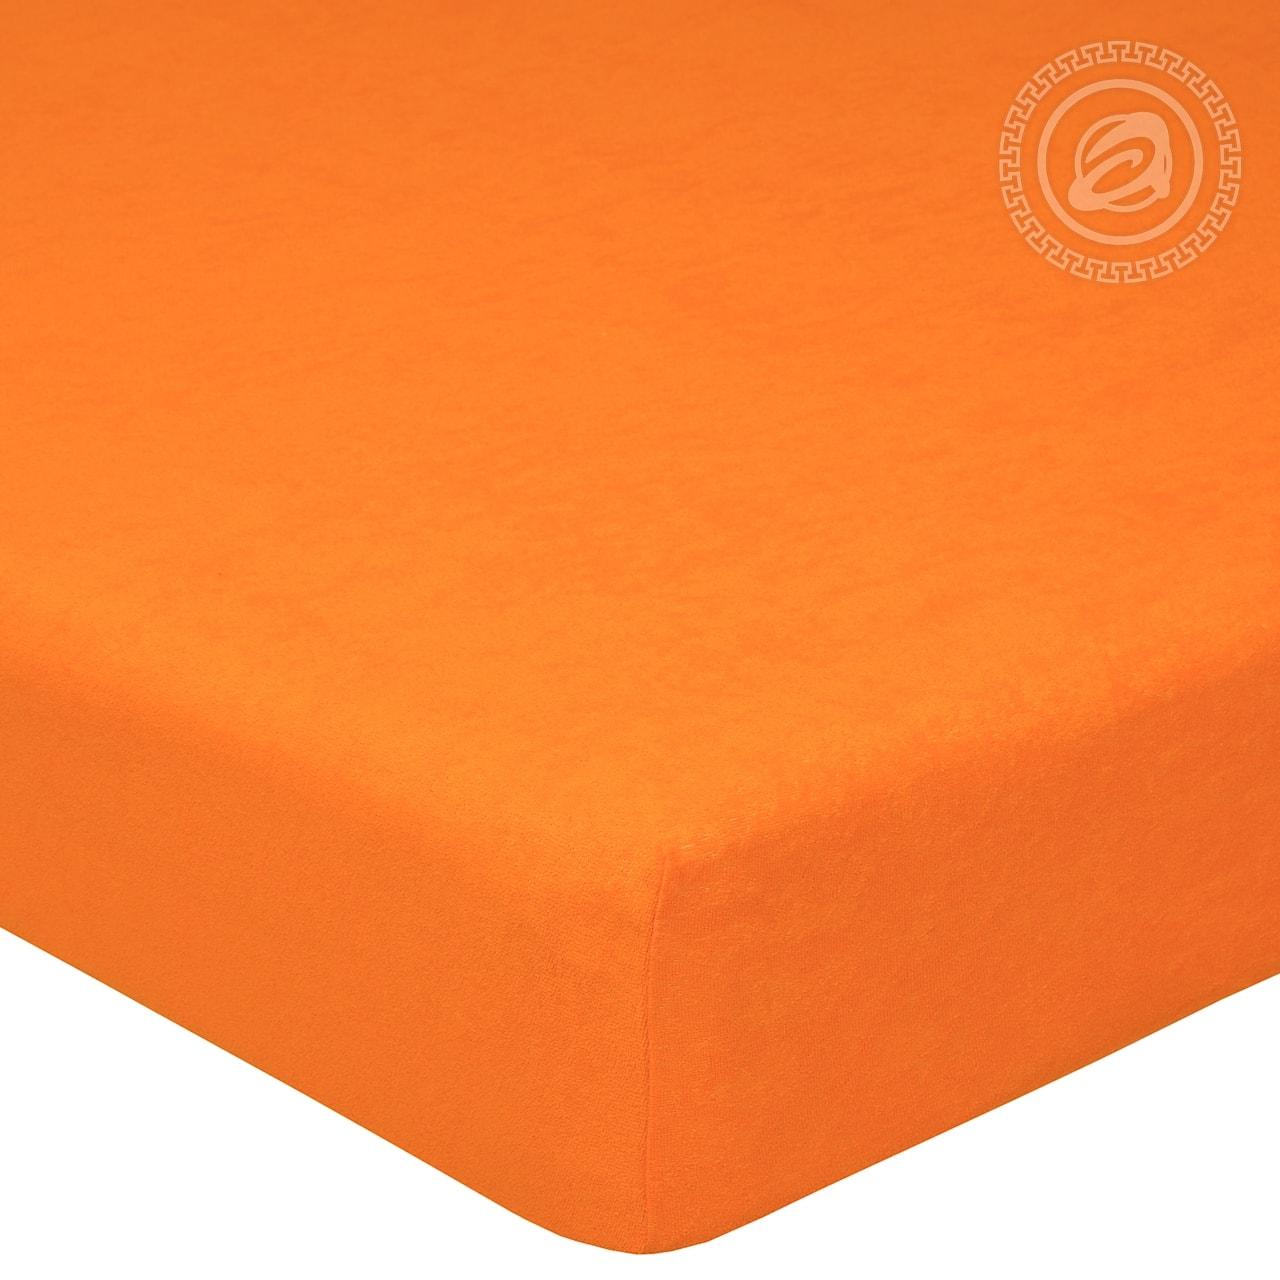 Простыня на резинке Апельсин (махра) (60х120) простыня на резинке ирис размер 60х120 см